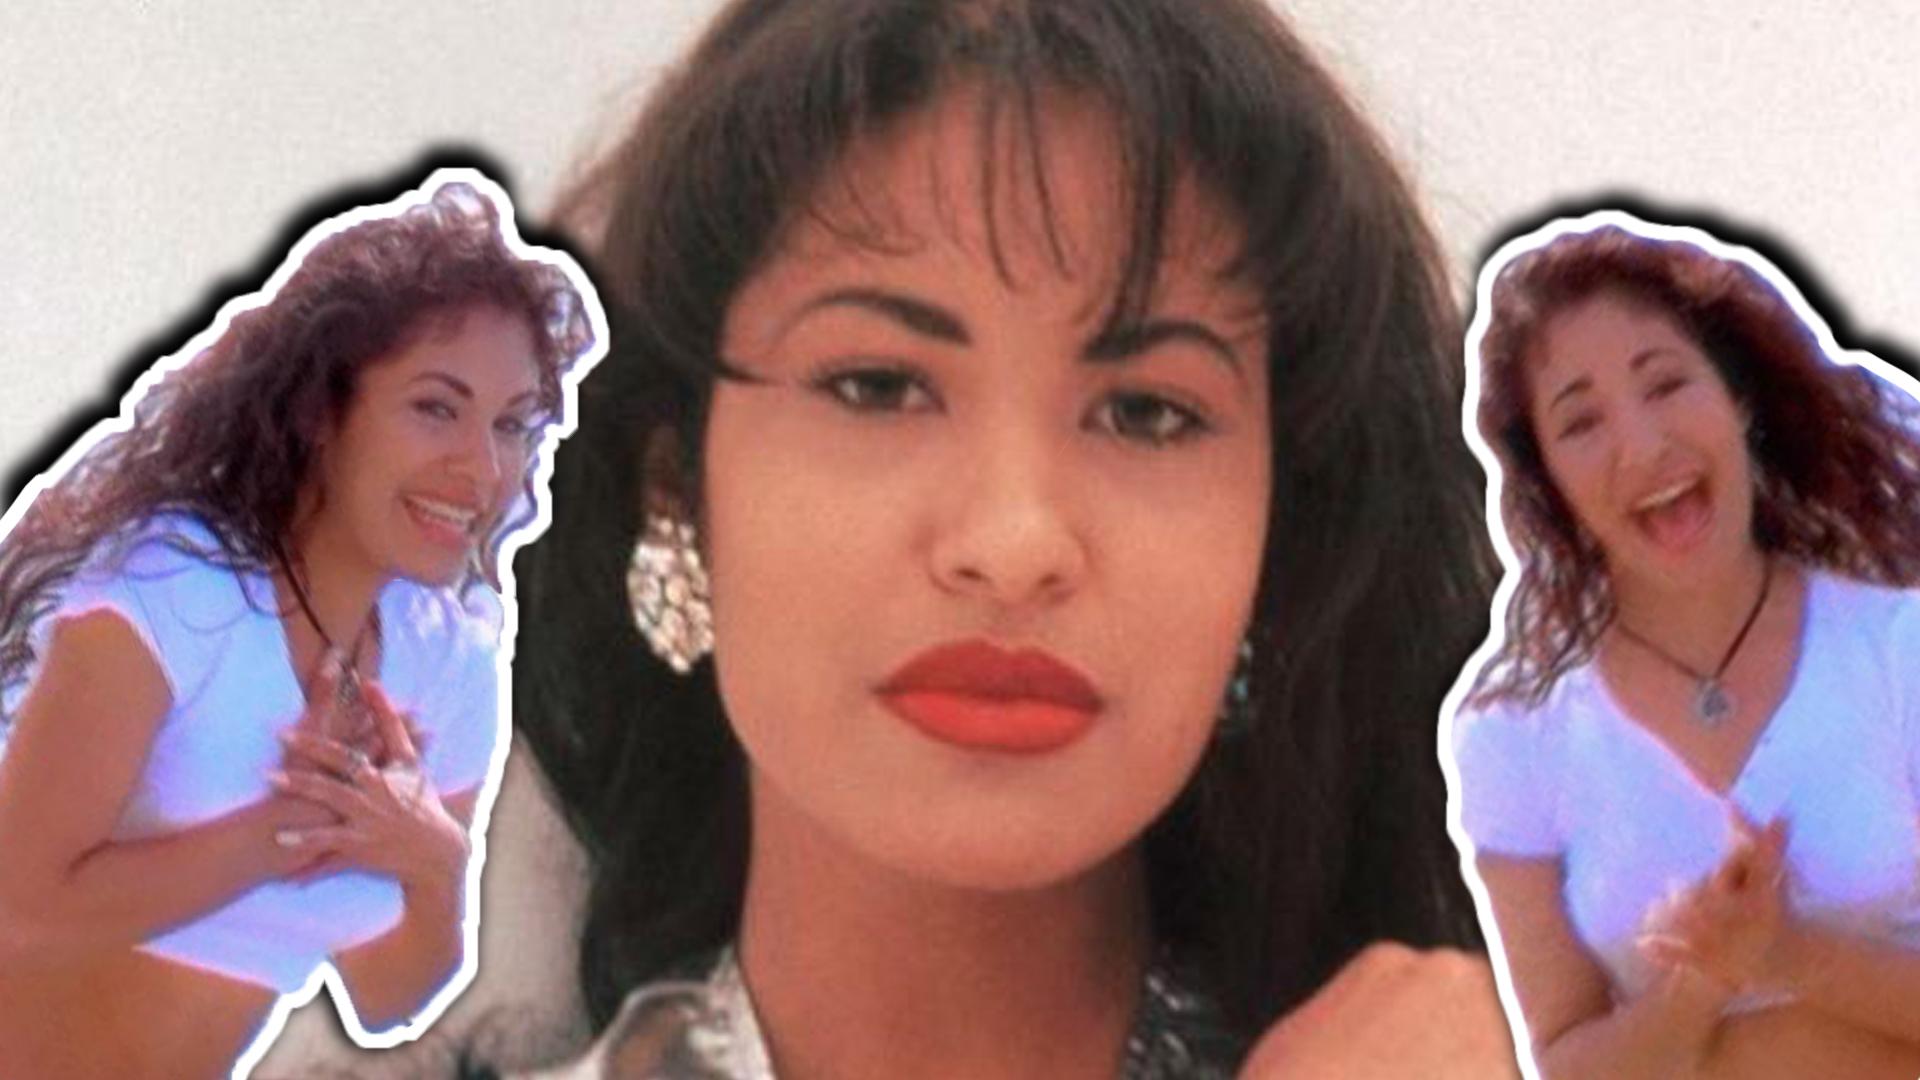 Bidi Bidi Bom Bom De Selena Originalmente Era En Ingles Itty Bitty Bubbles Estaciones De Radio Musica Univision